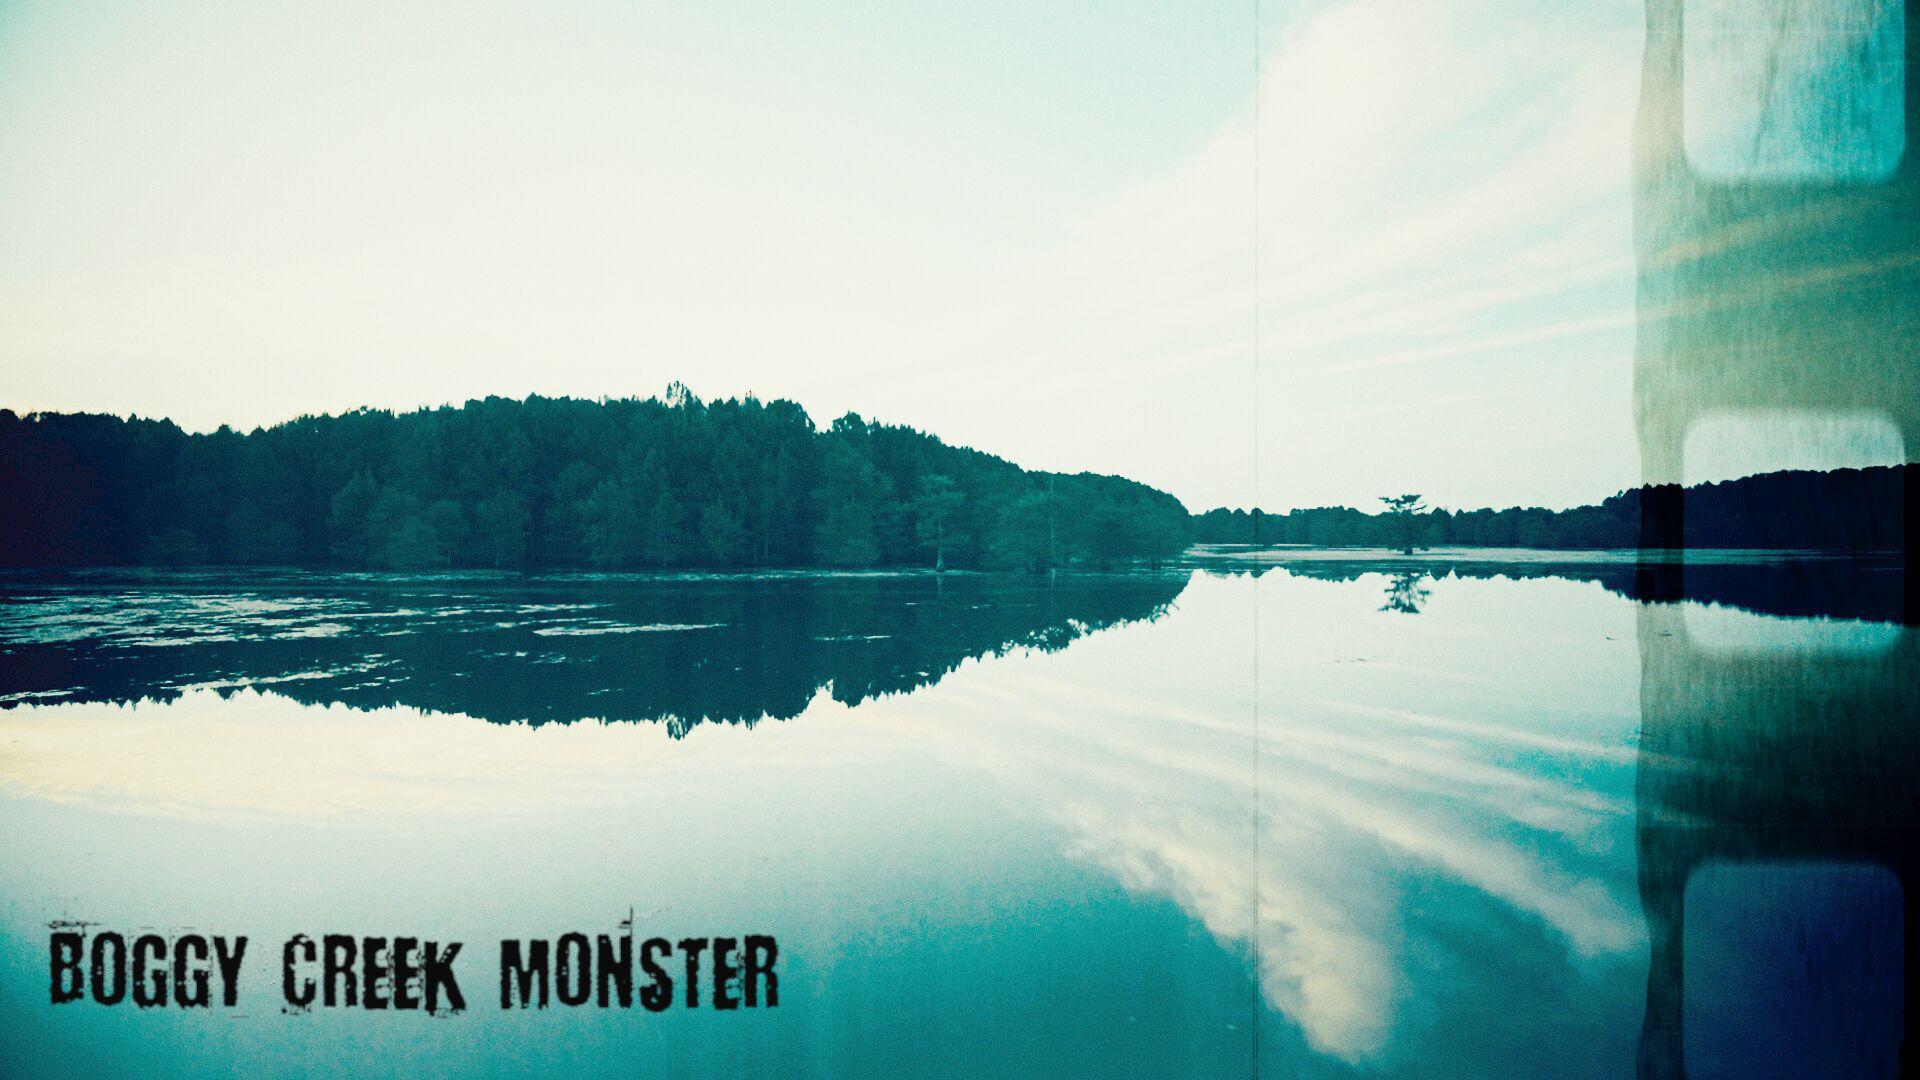 Boggy Creek Monster (2016)